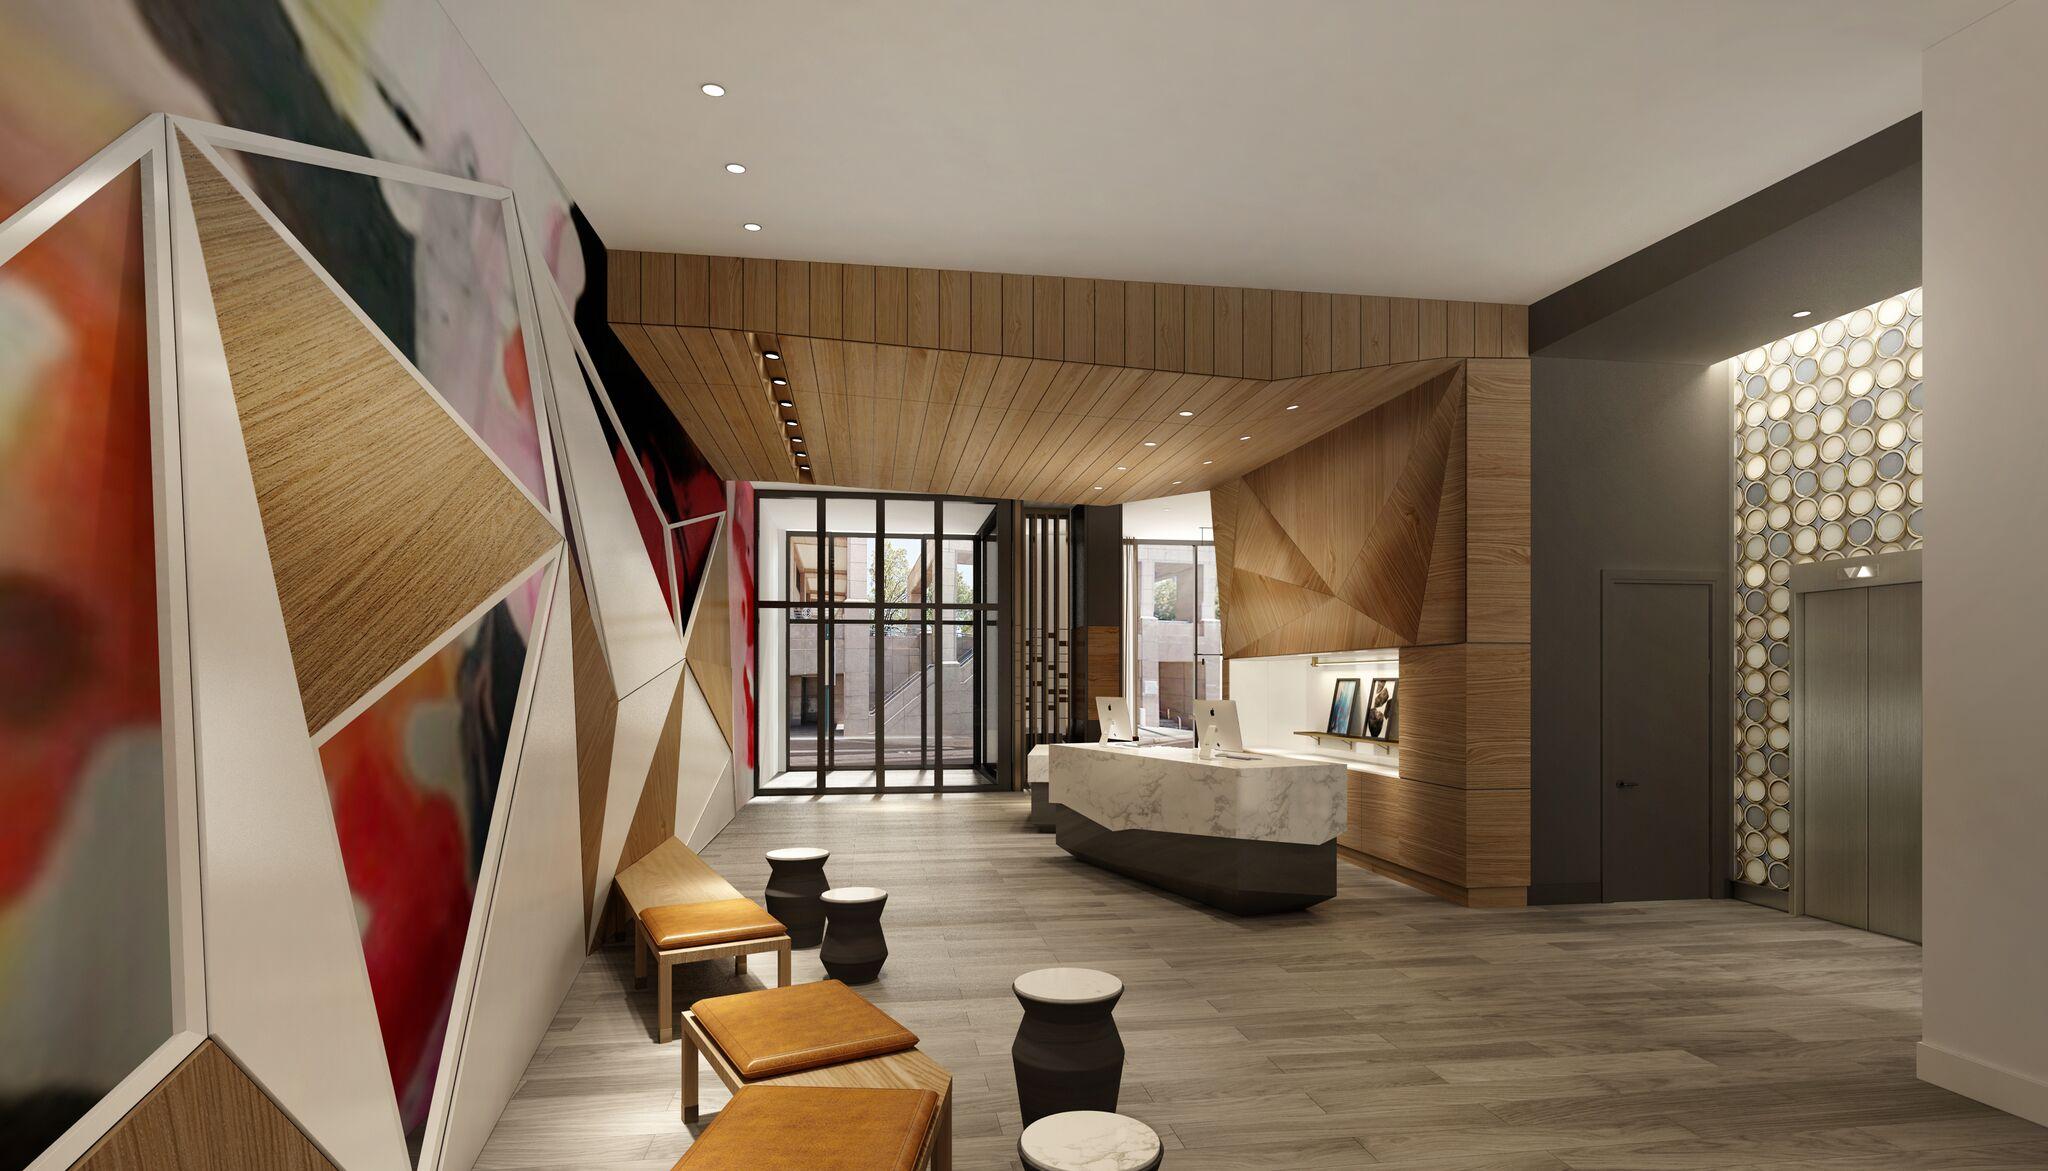 a rendering of an art-focused hotel lobby